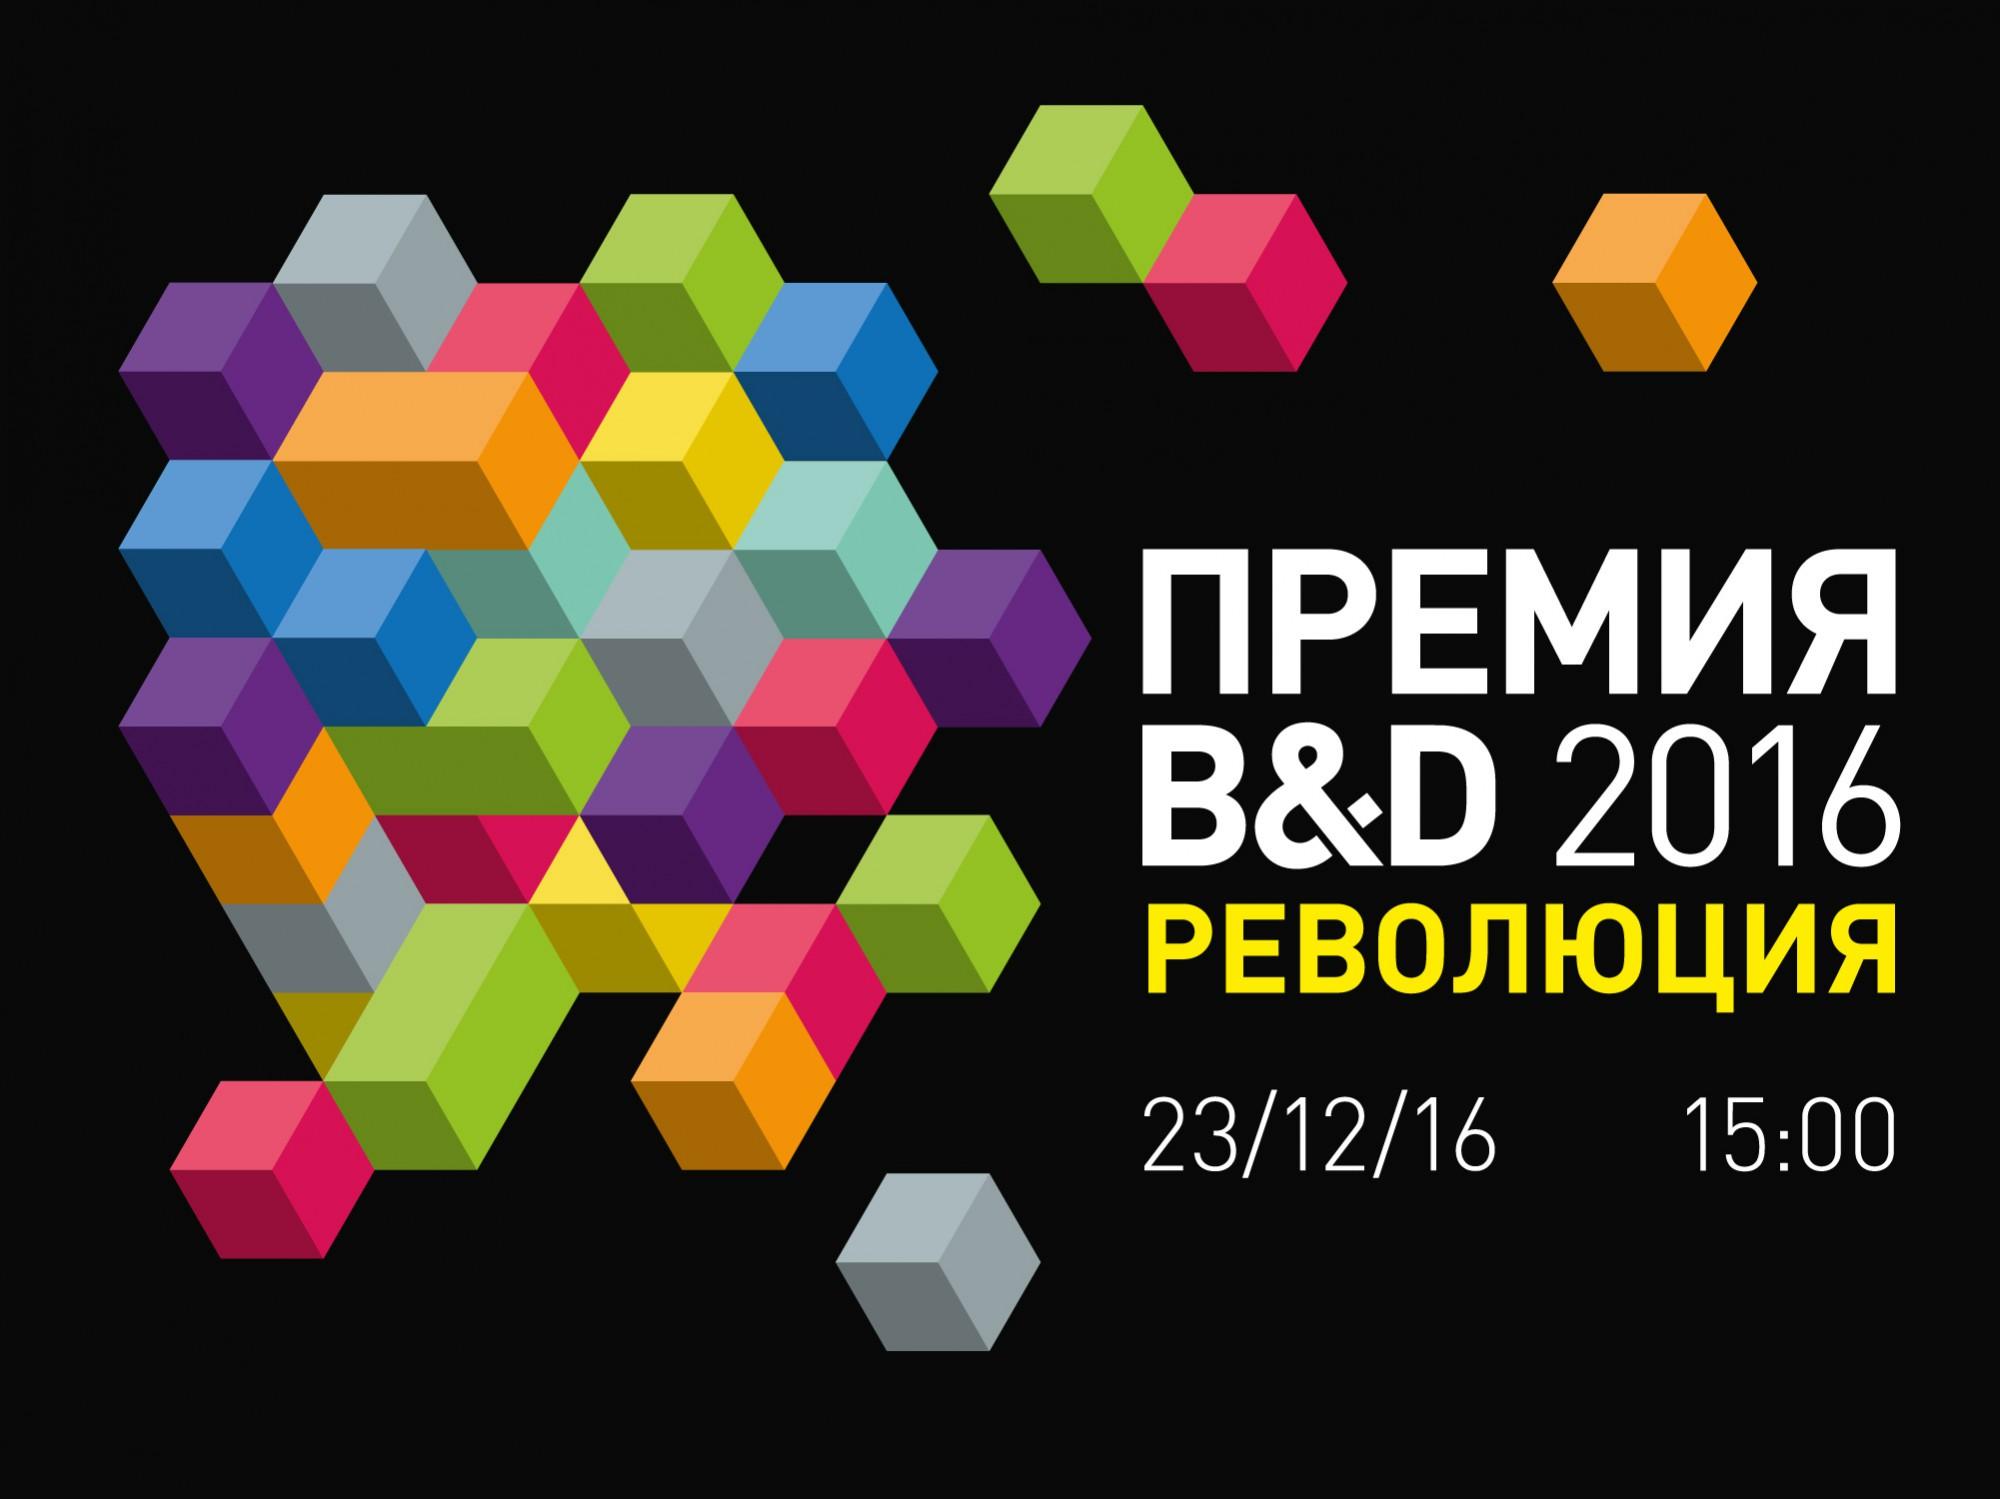 revolution_2016_12_12_v4_2000x1500